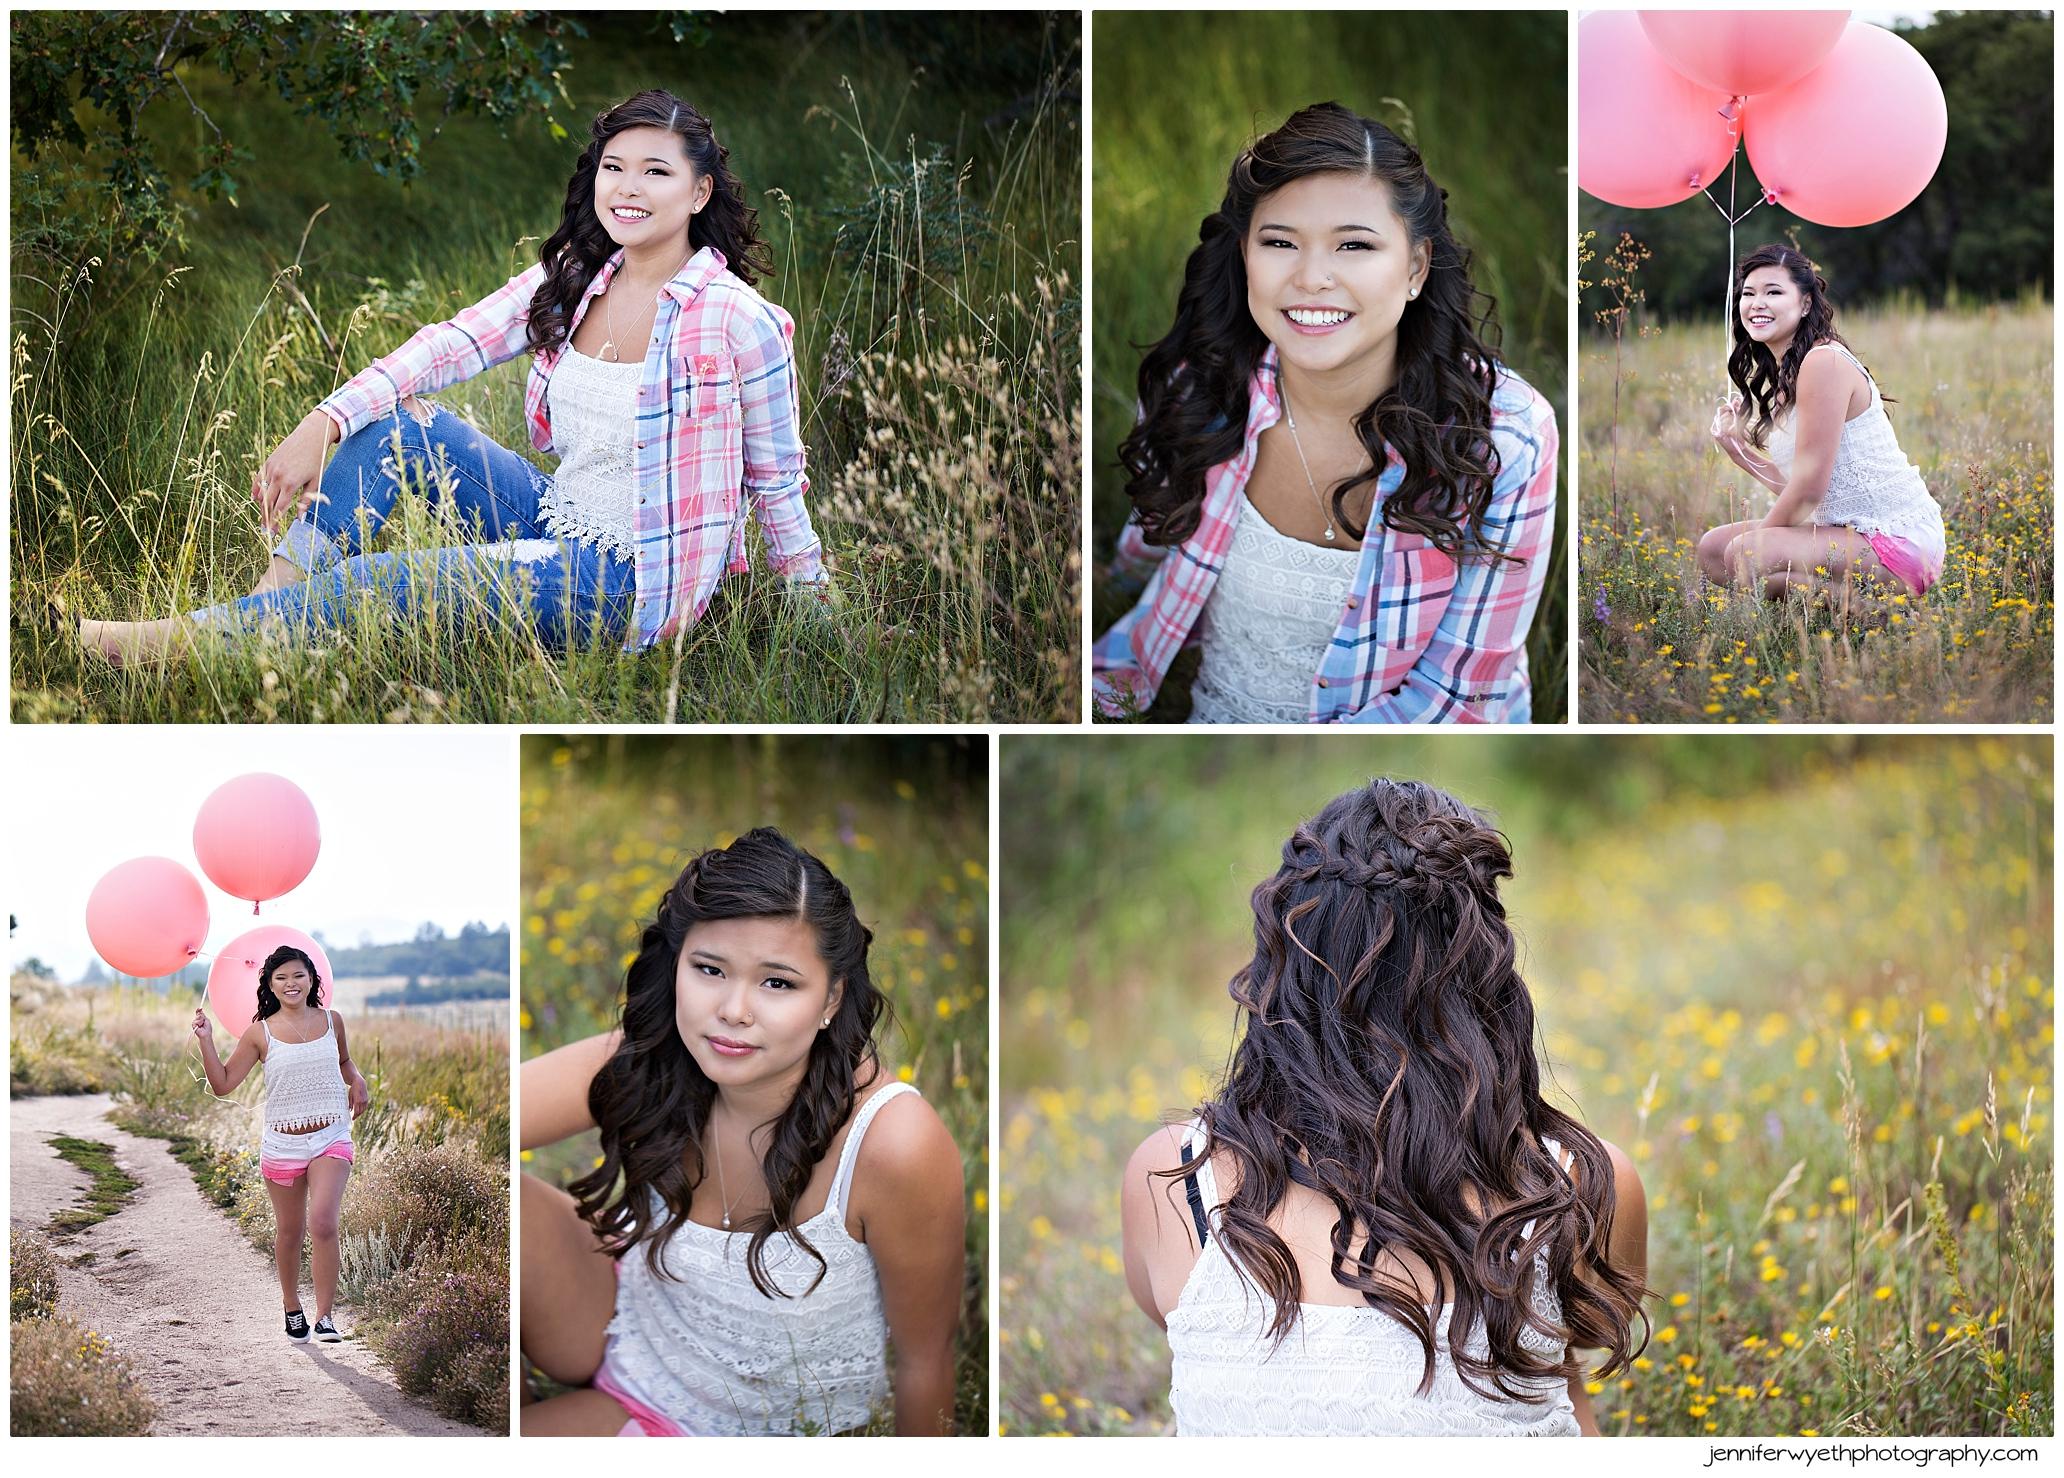 Jennifer-Wyeth-photography-senior-pictures-colorado-springs-photographer_0204.jpg